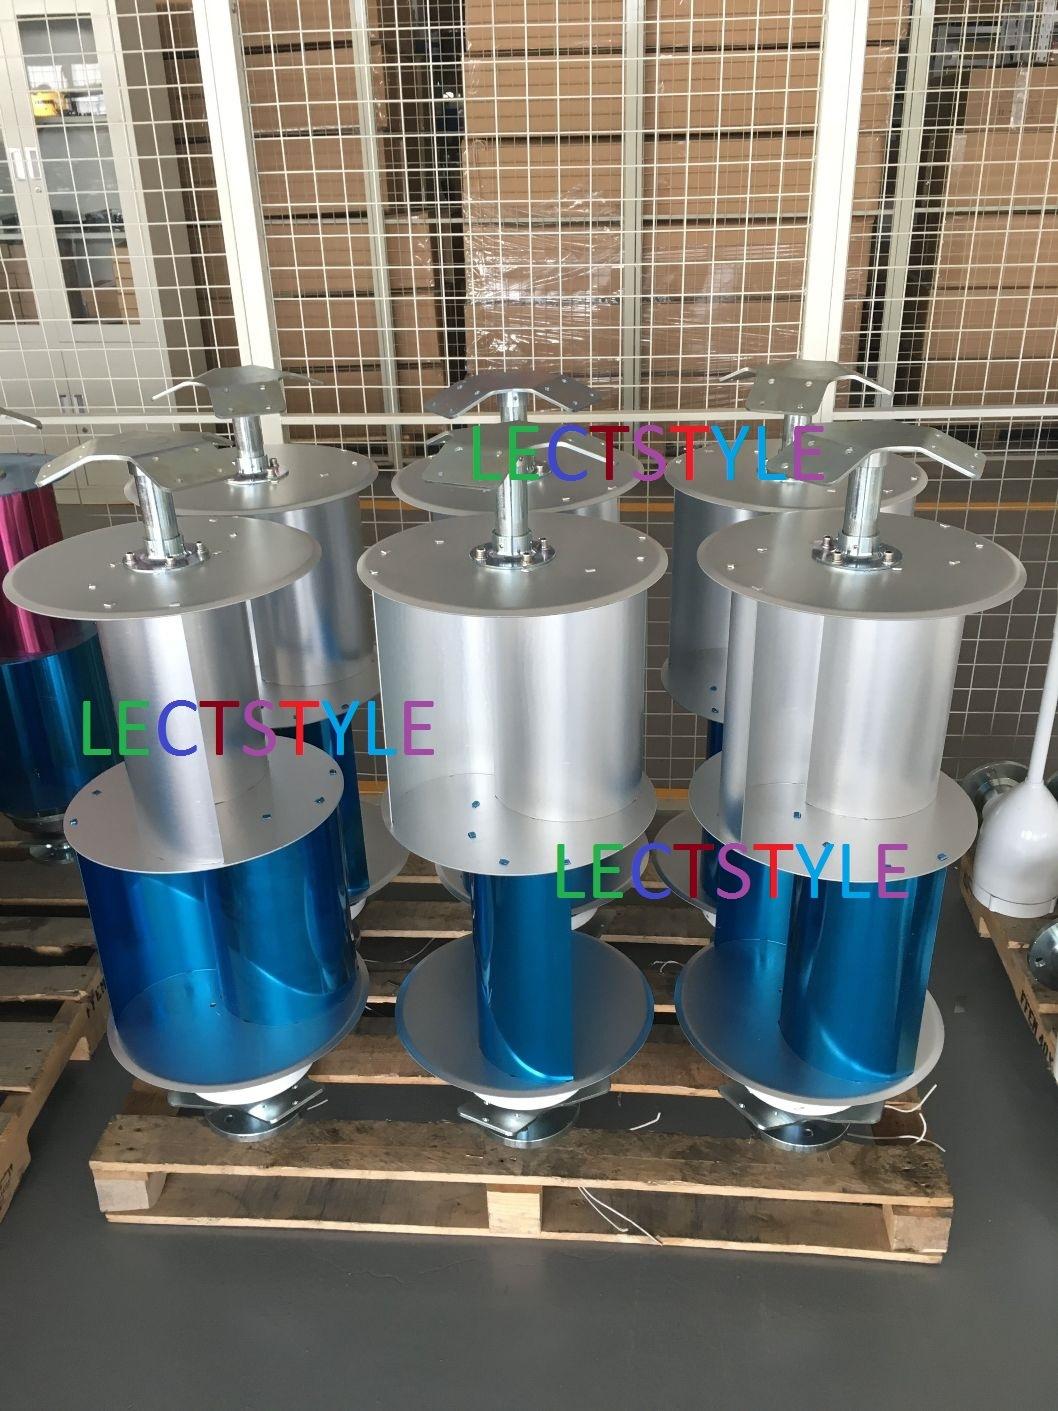 12V 24V 200W Vertical Axis Wind Turbine / Wind Generator